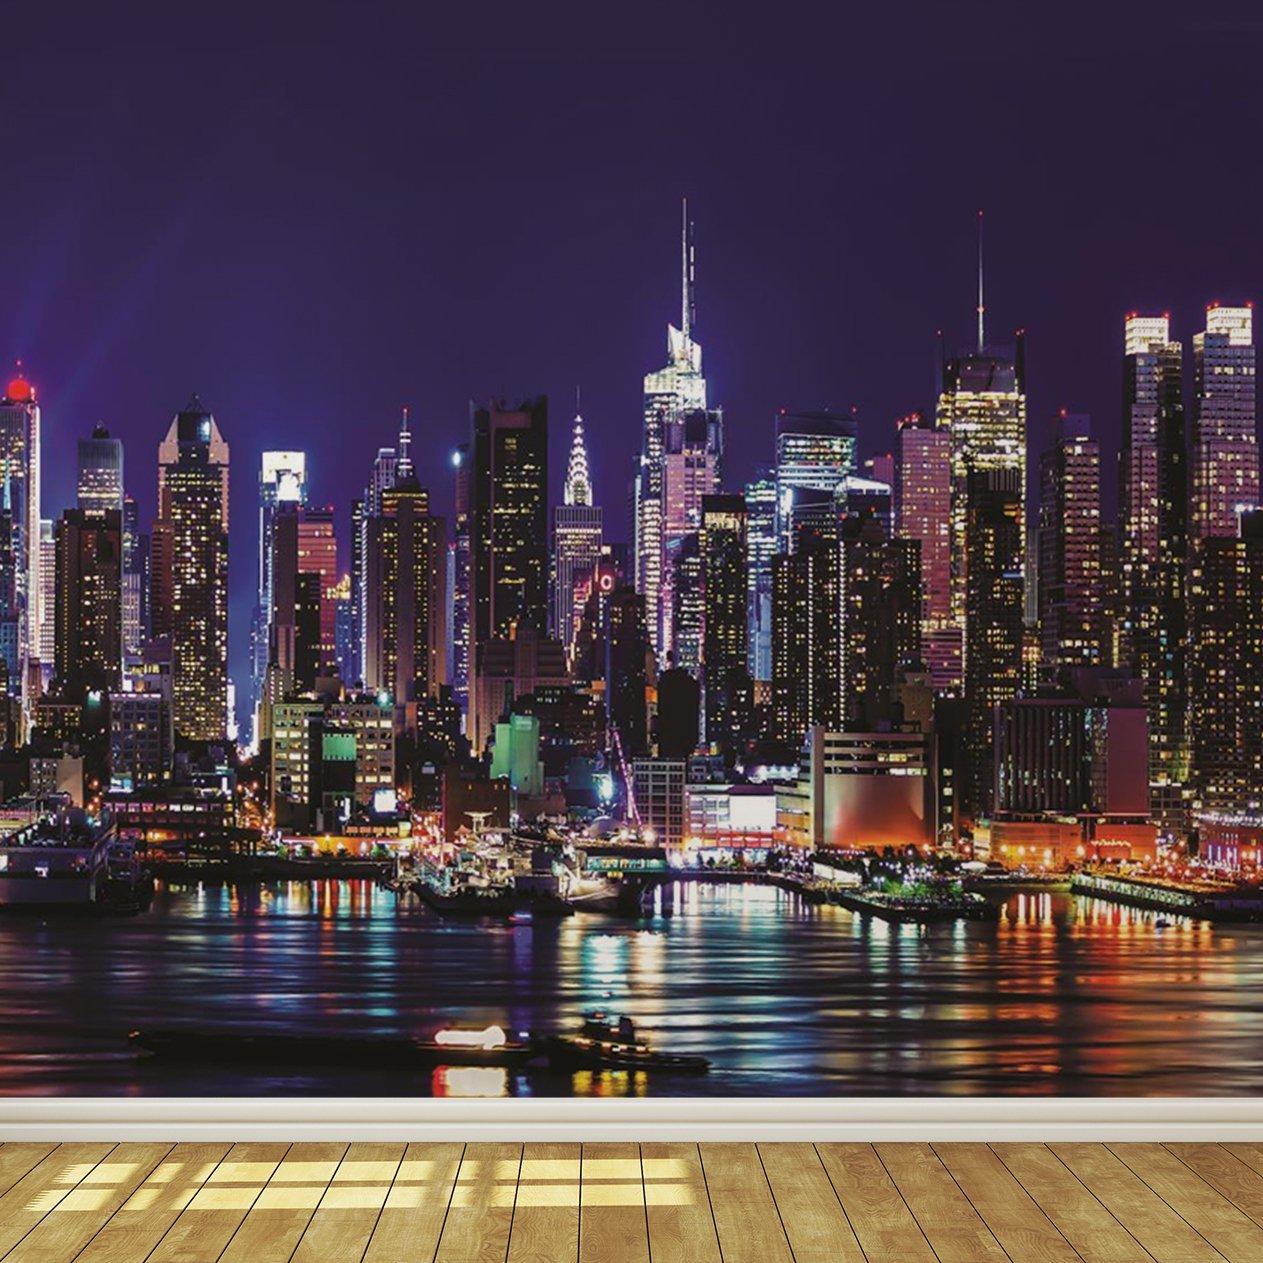 Buy New York City Skyline At Night 7 Wallpaper Mural In Cheap Price